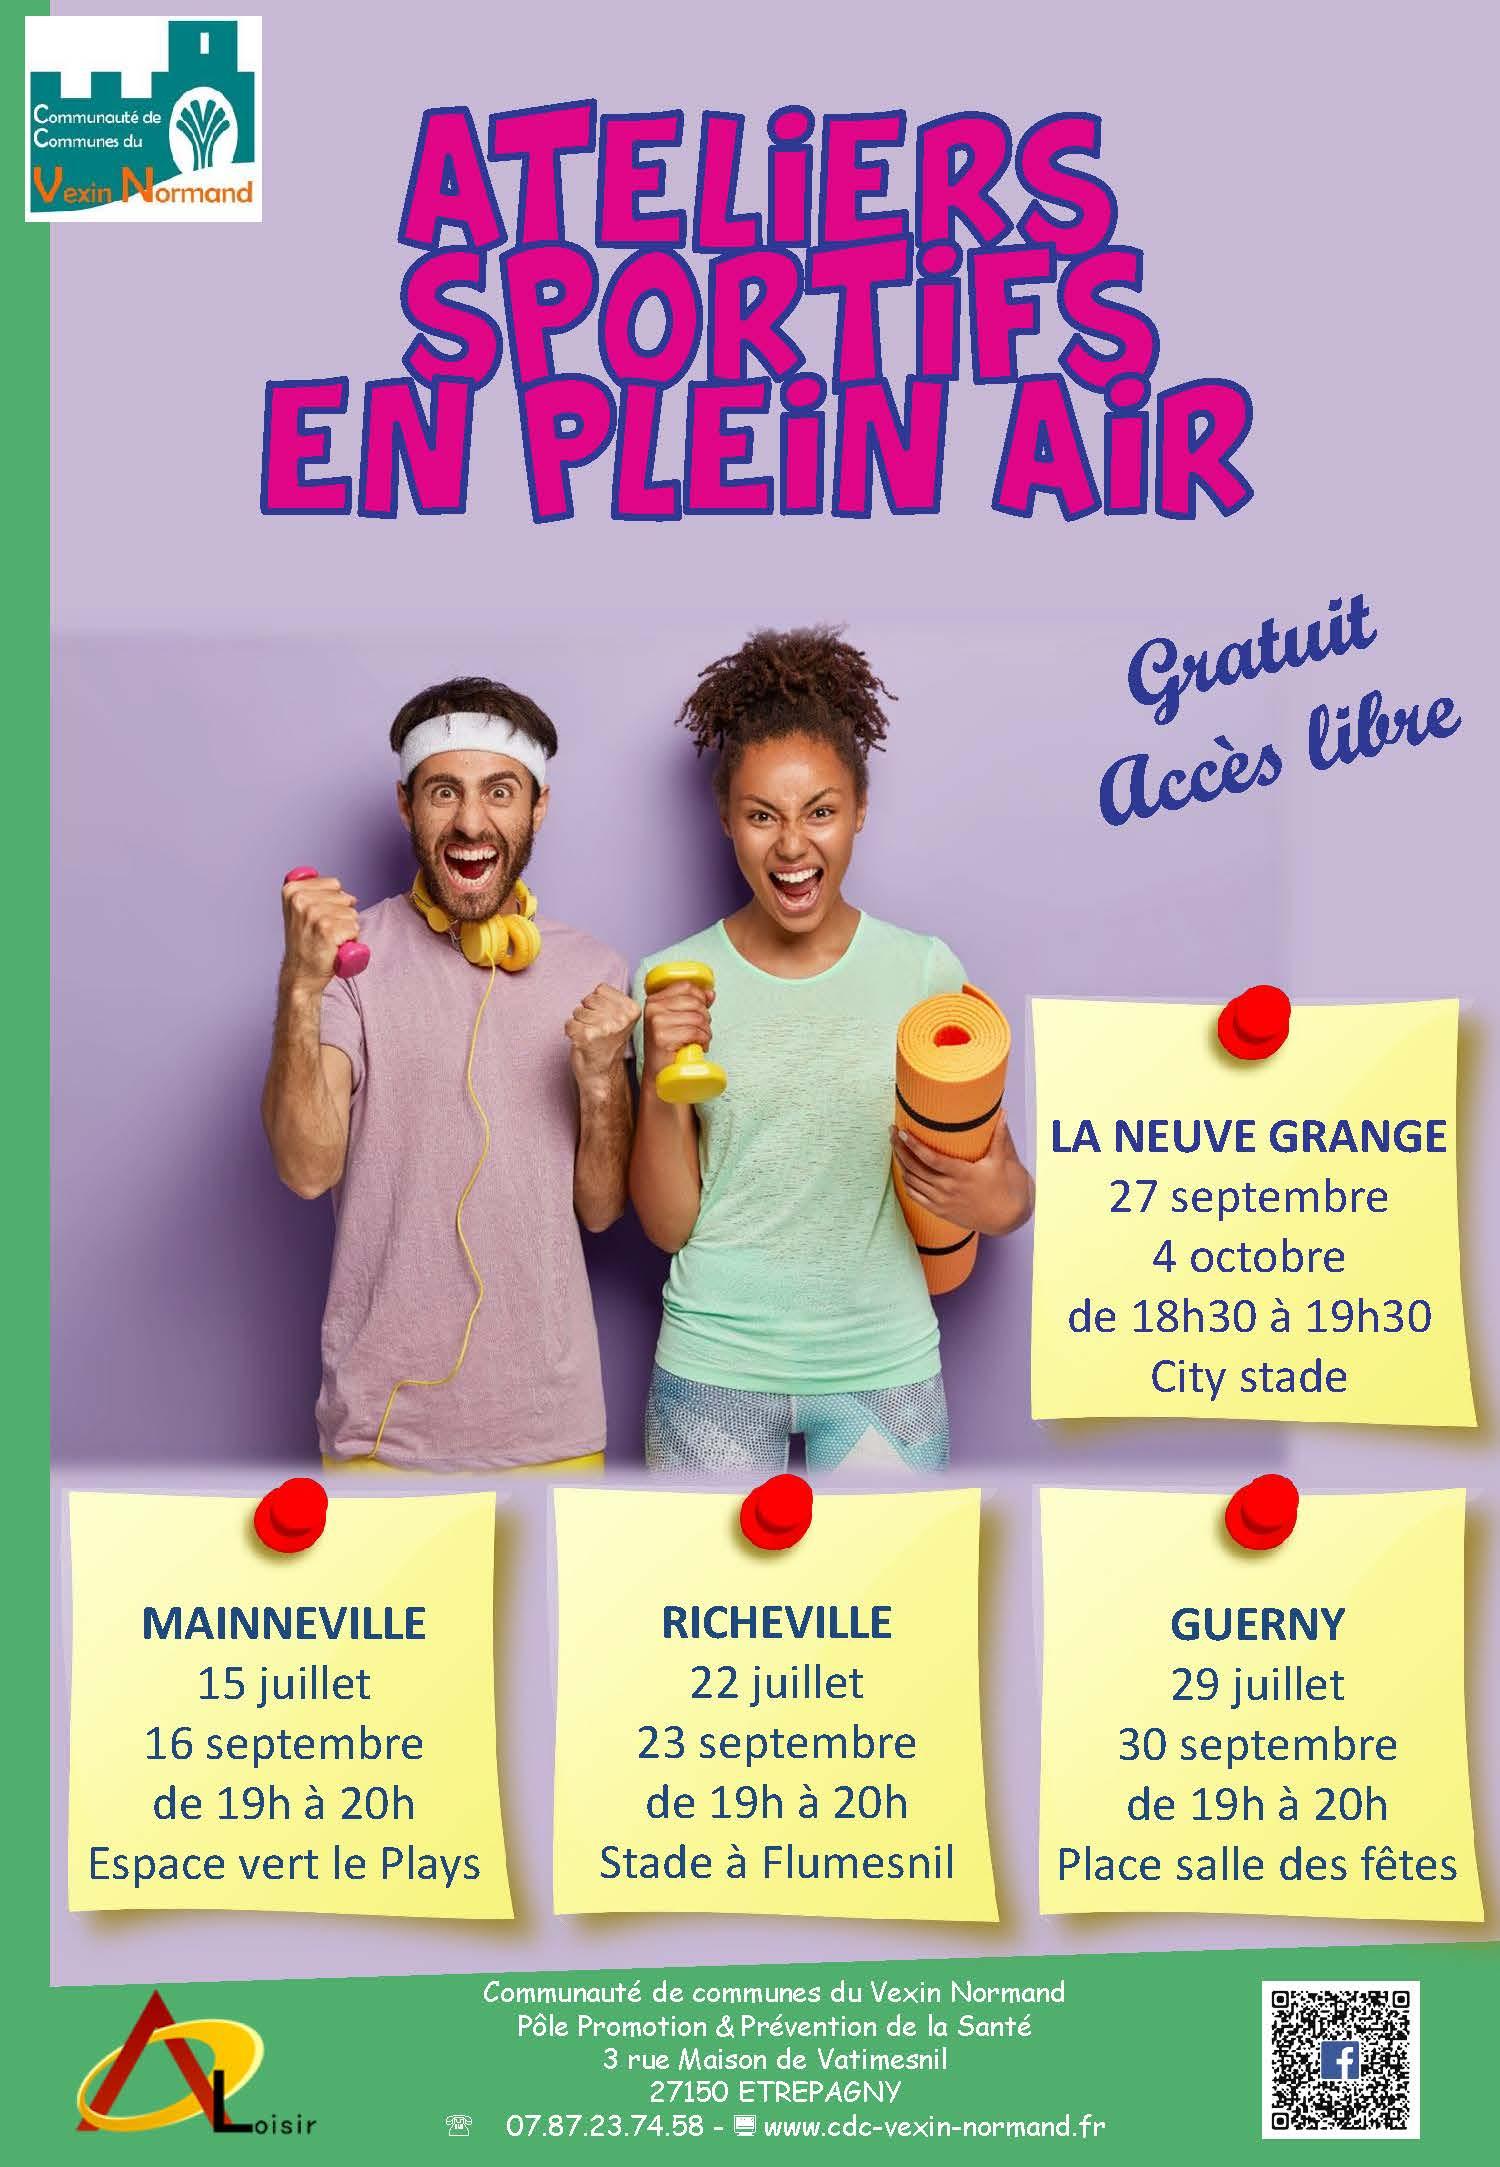 Affiche_ateliers_sportifs_plein_air_-_été_2021__